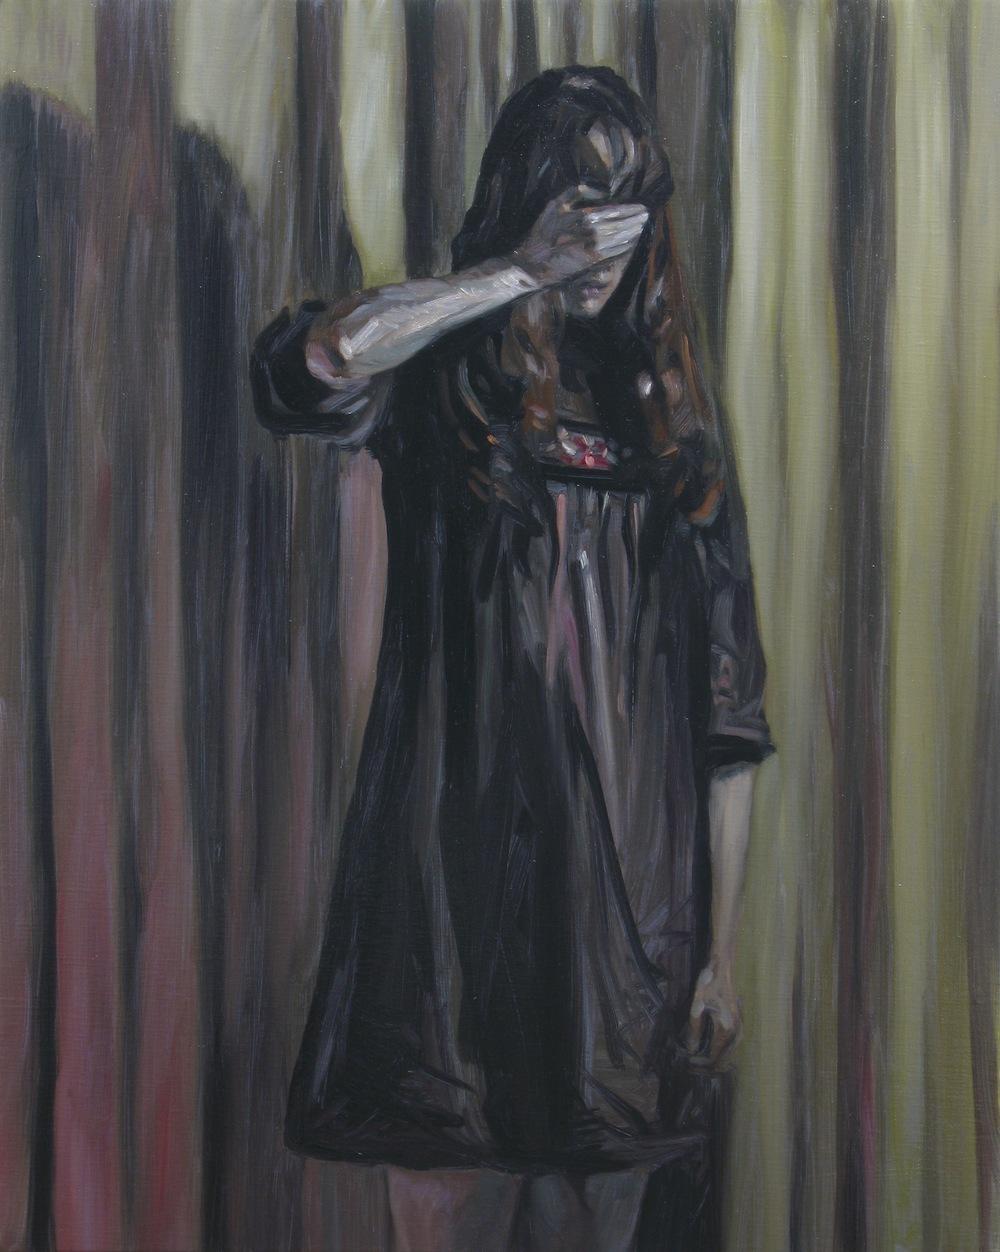 The Unseen, Oil on linen, 50x40cm, 2013